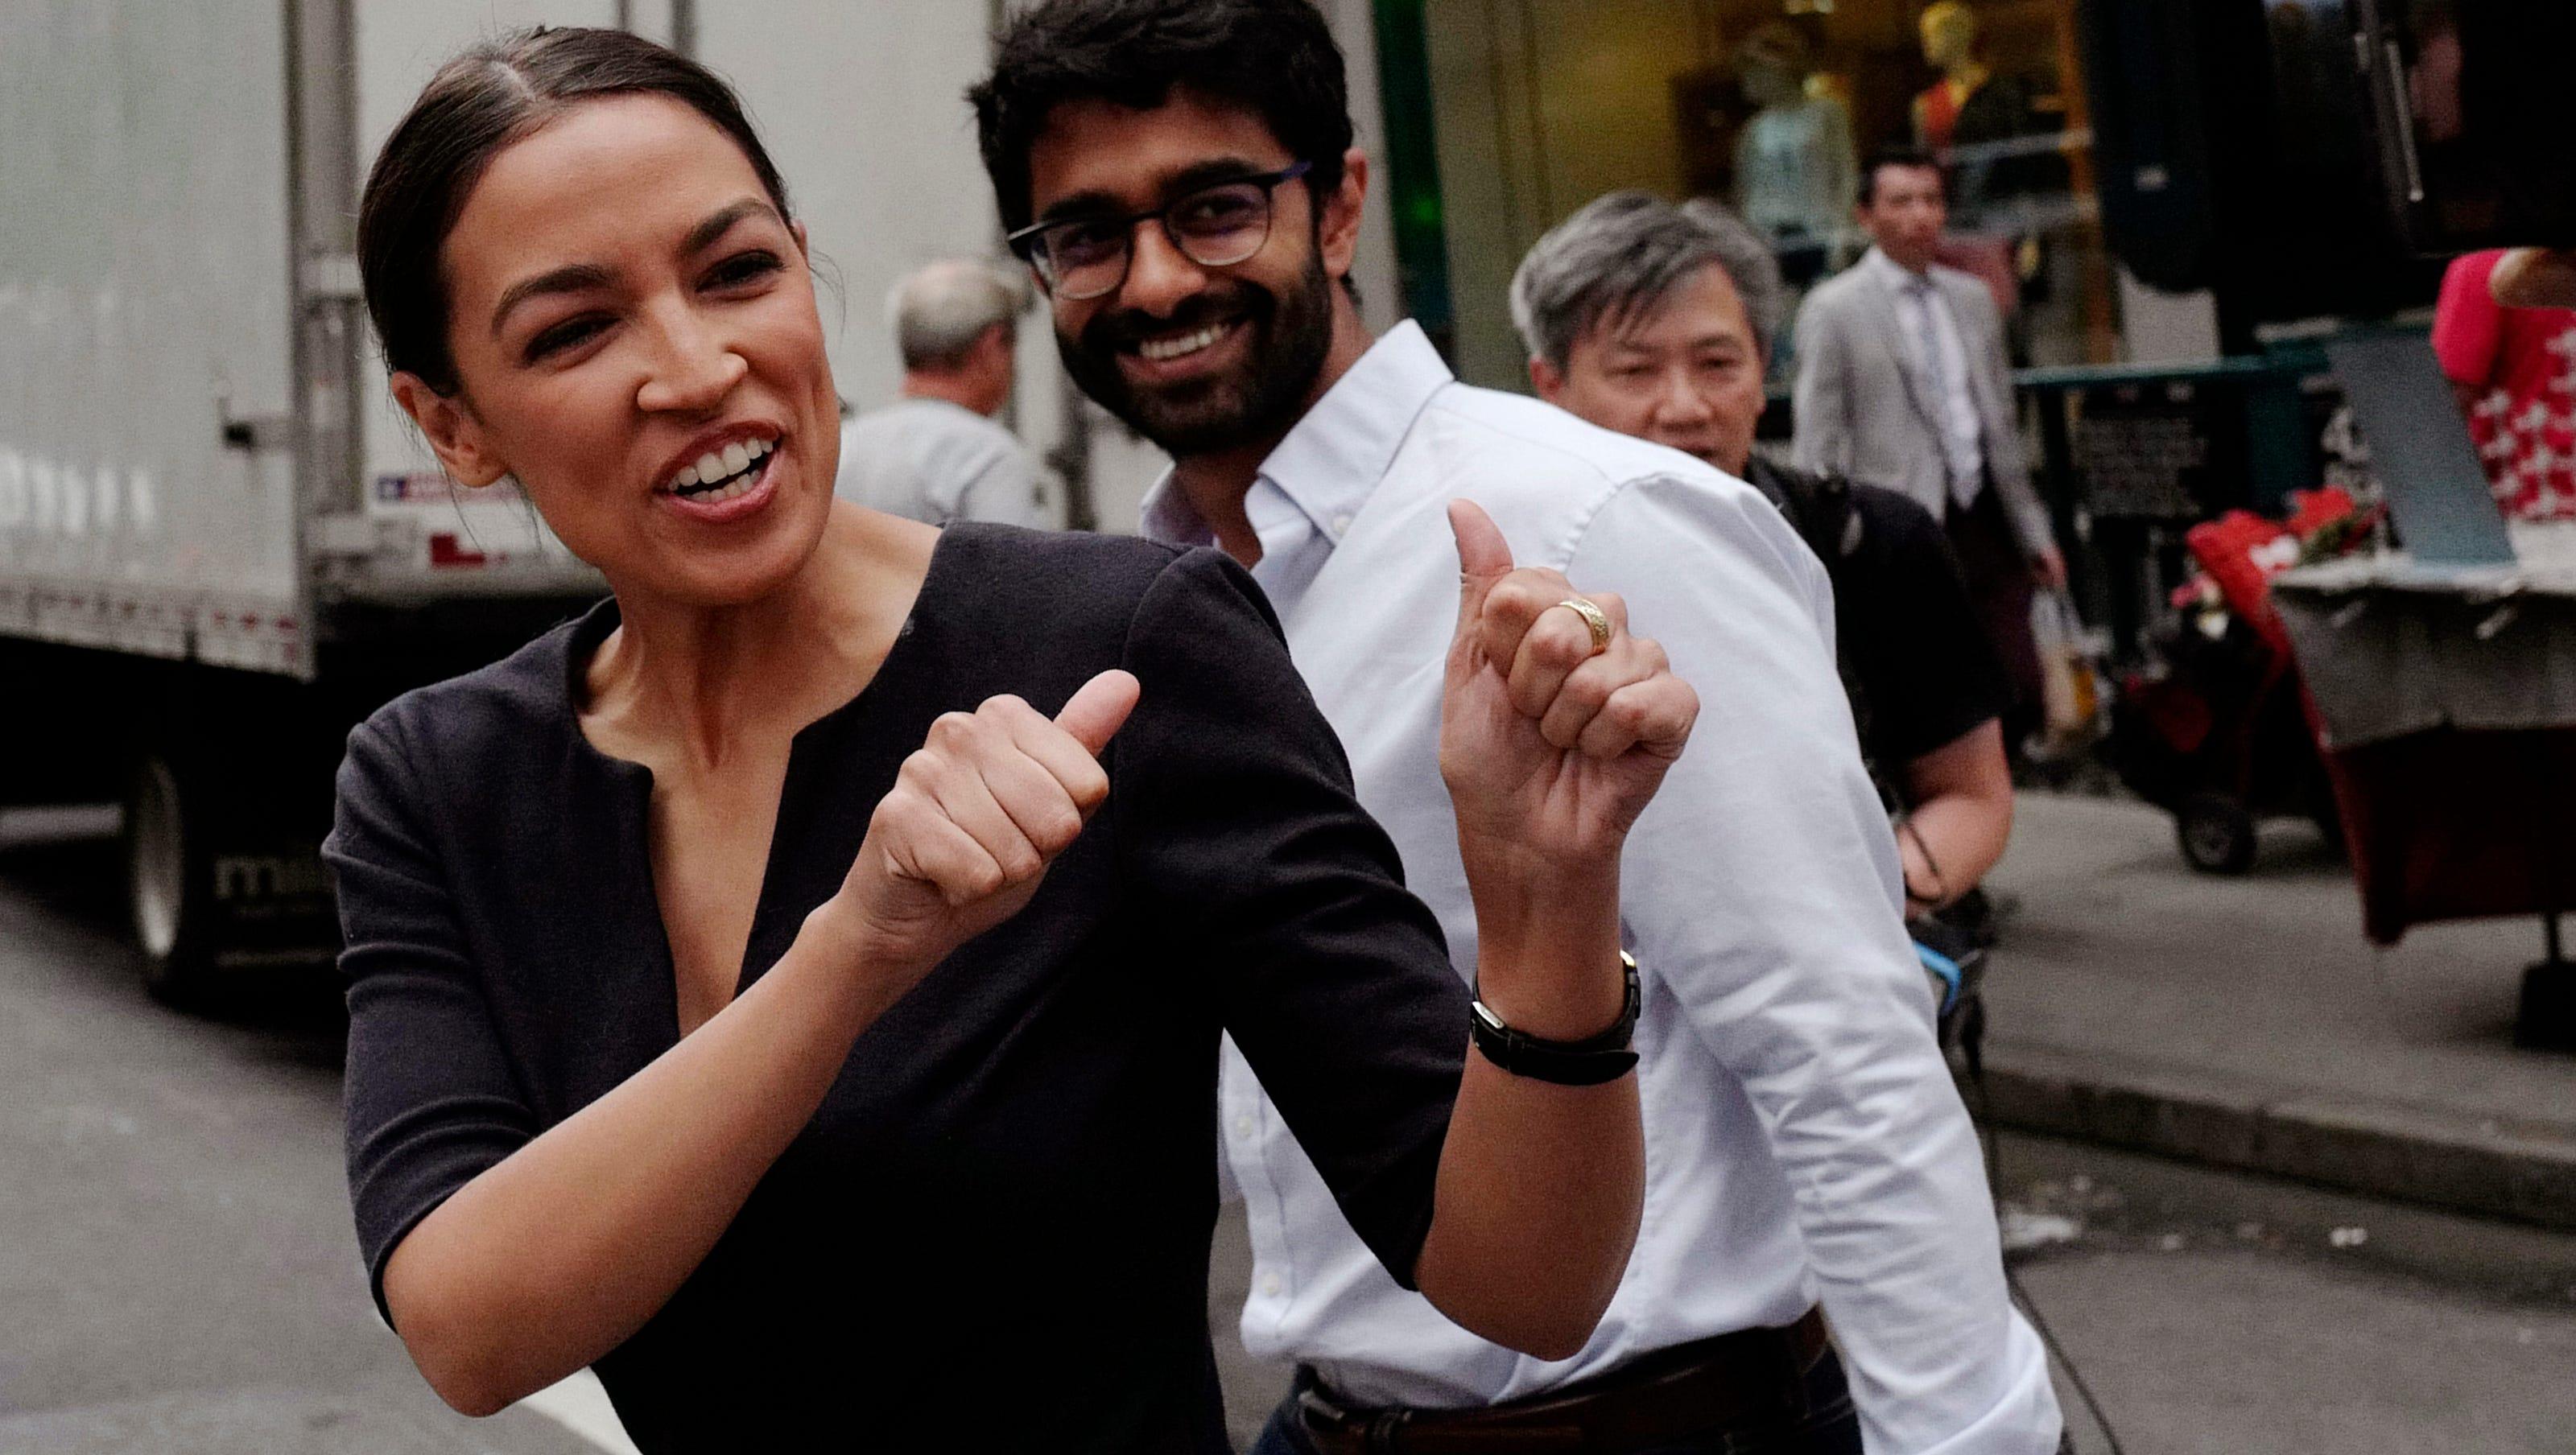 https://www.usatoday.com/story/opinion/voices/2018/08/28/democrat-family-escaped-socialism-ocasio-cortez-worries-me-column/1106307002/